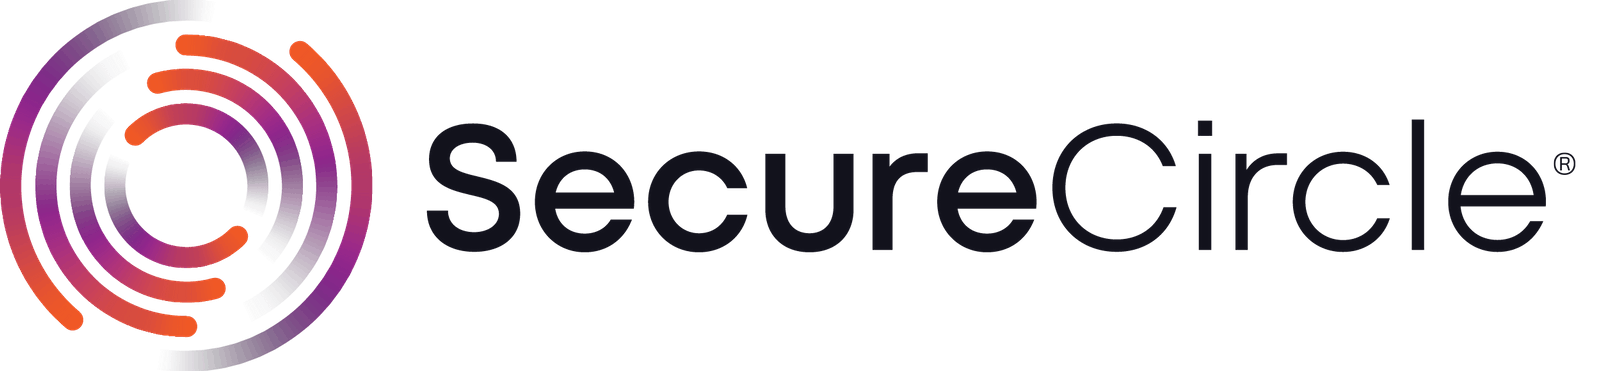 SecureCircle light background dark text logo